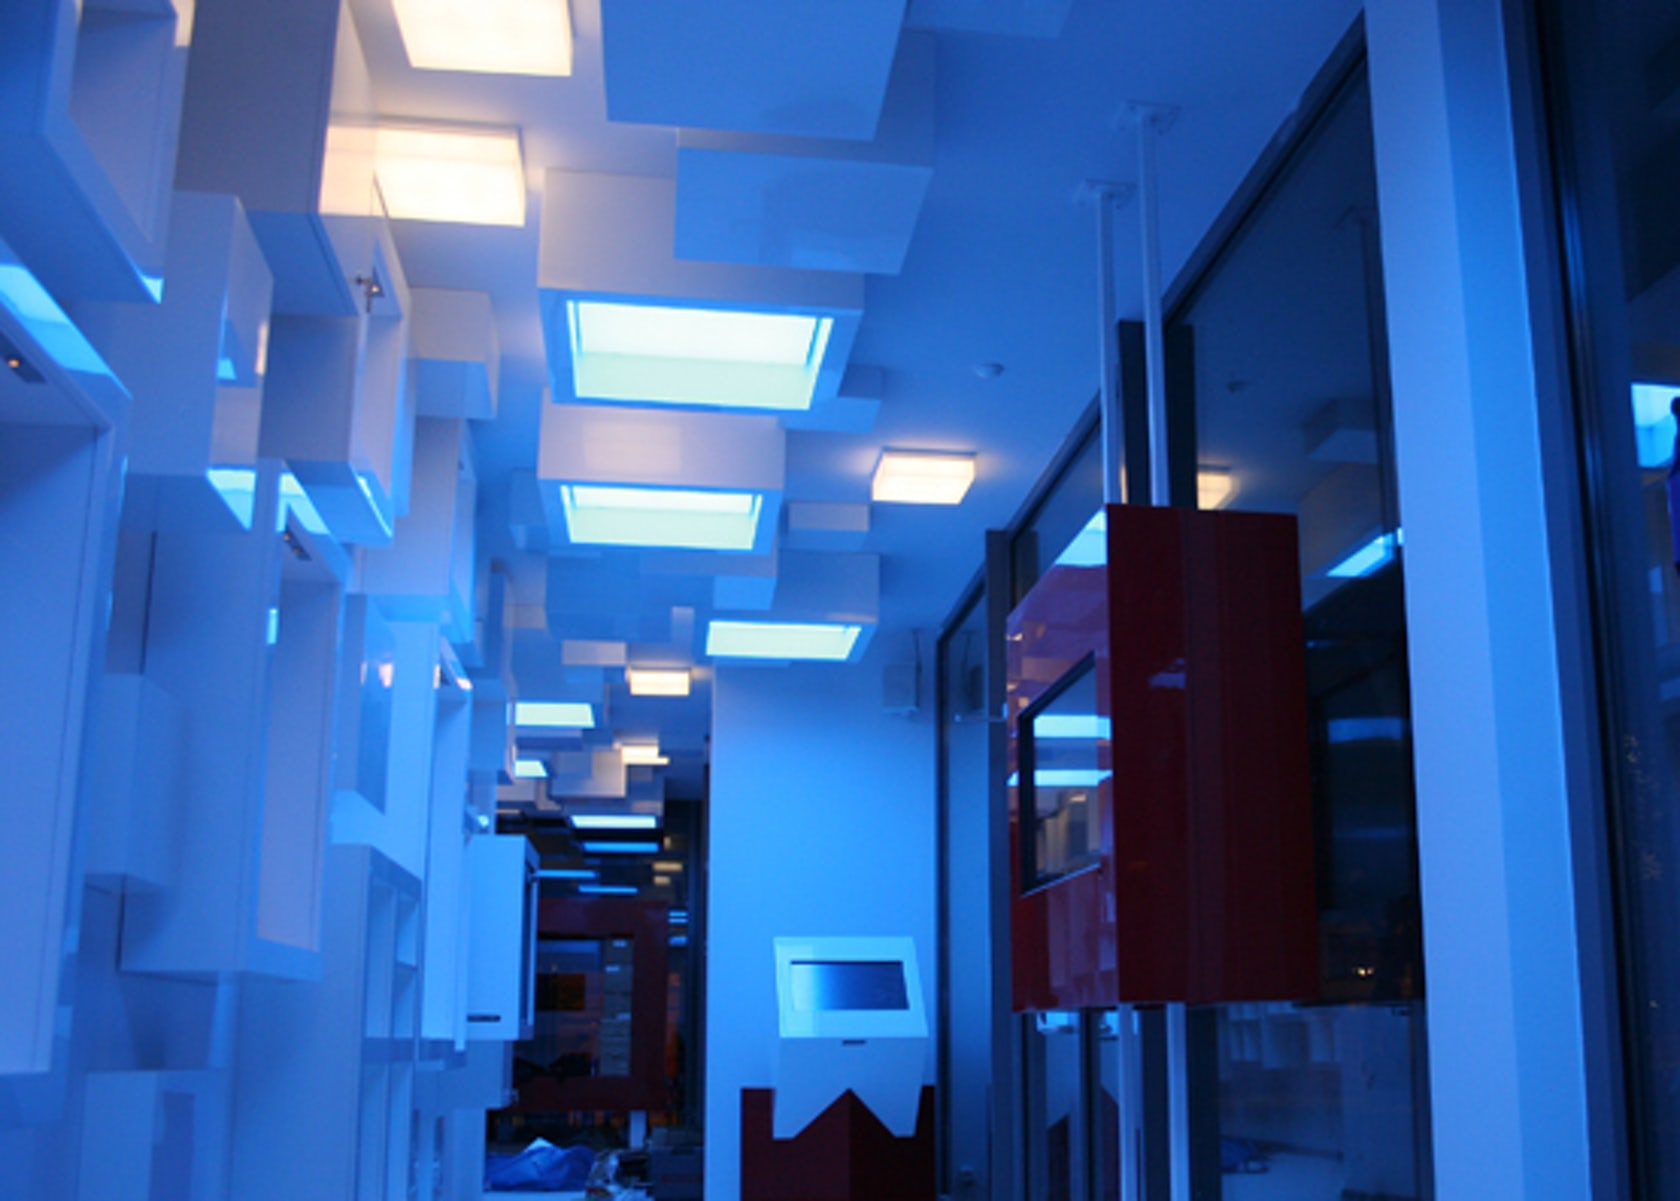 zumtobel lighting gmbh architizer. Black Bedroom Furniture Sets. Home Design Ideas